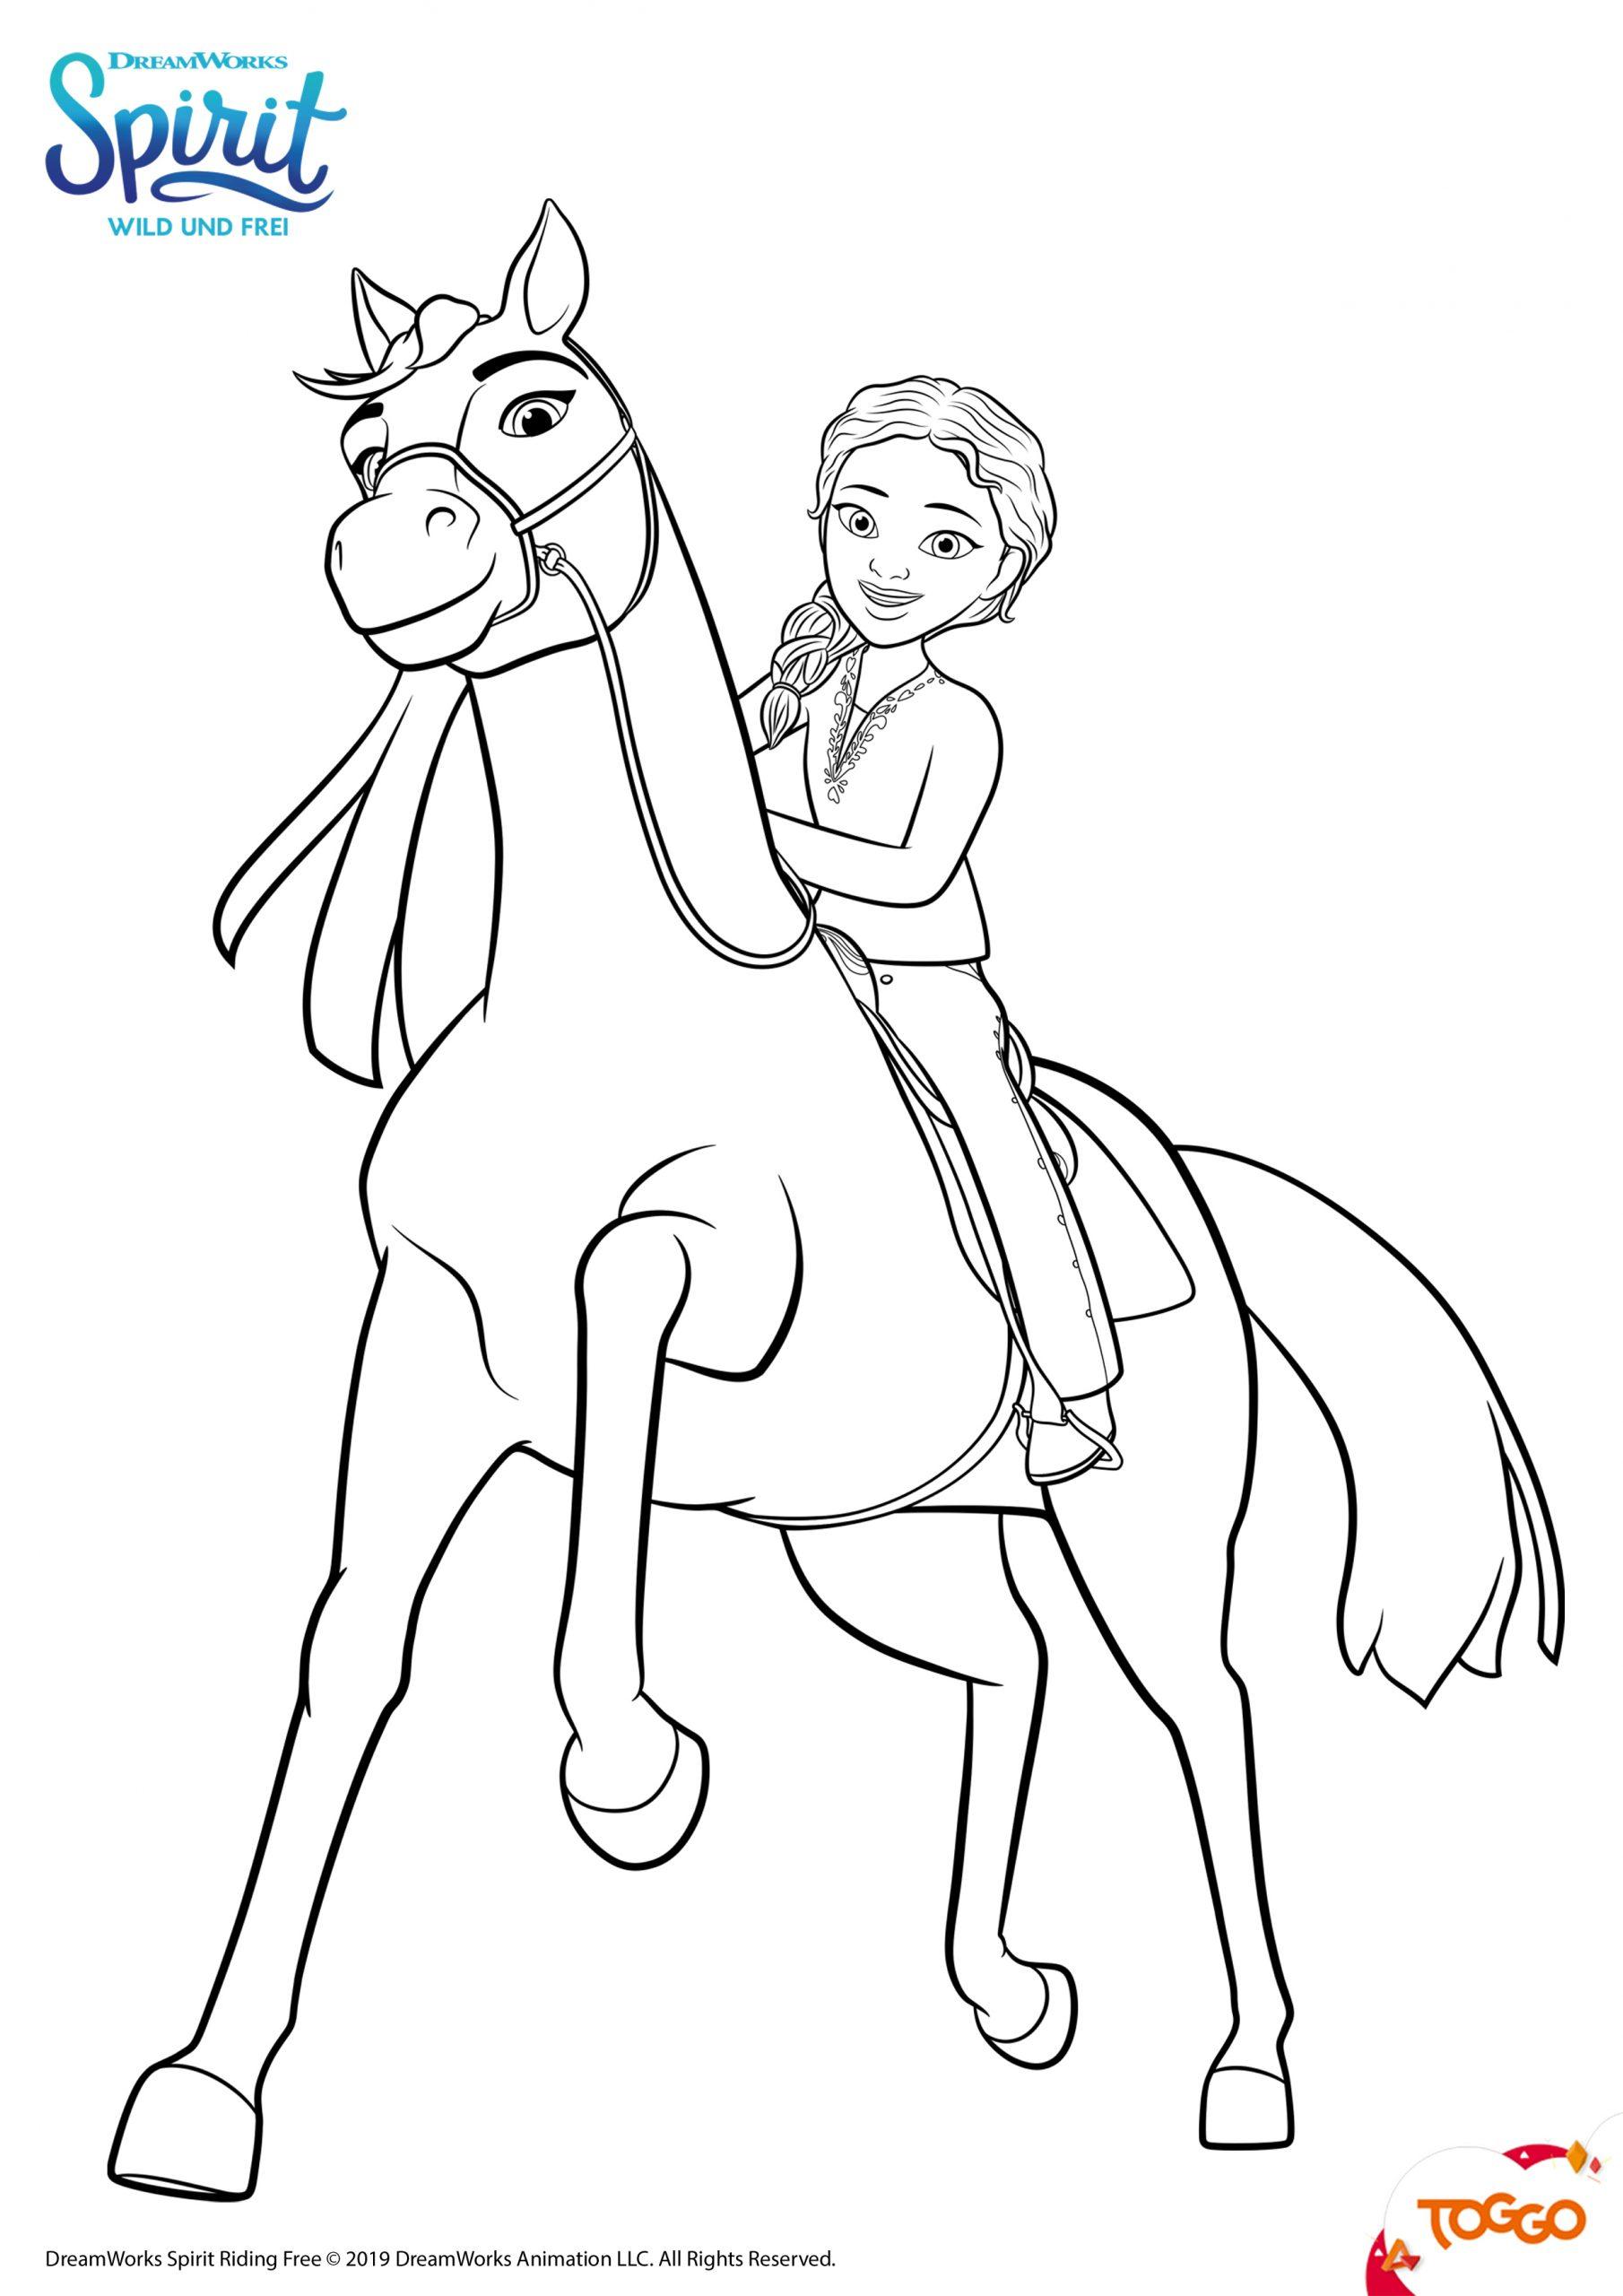 spirit ausmalbilder | mytoys-blog bestimmt für pferde